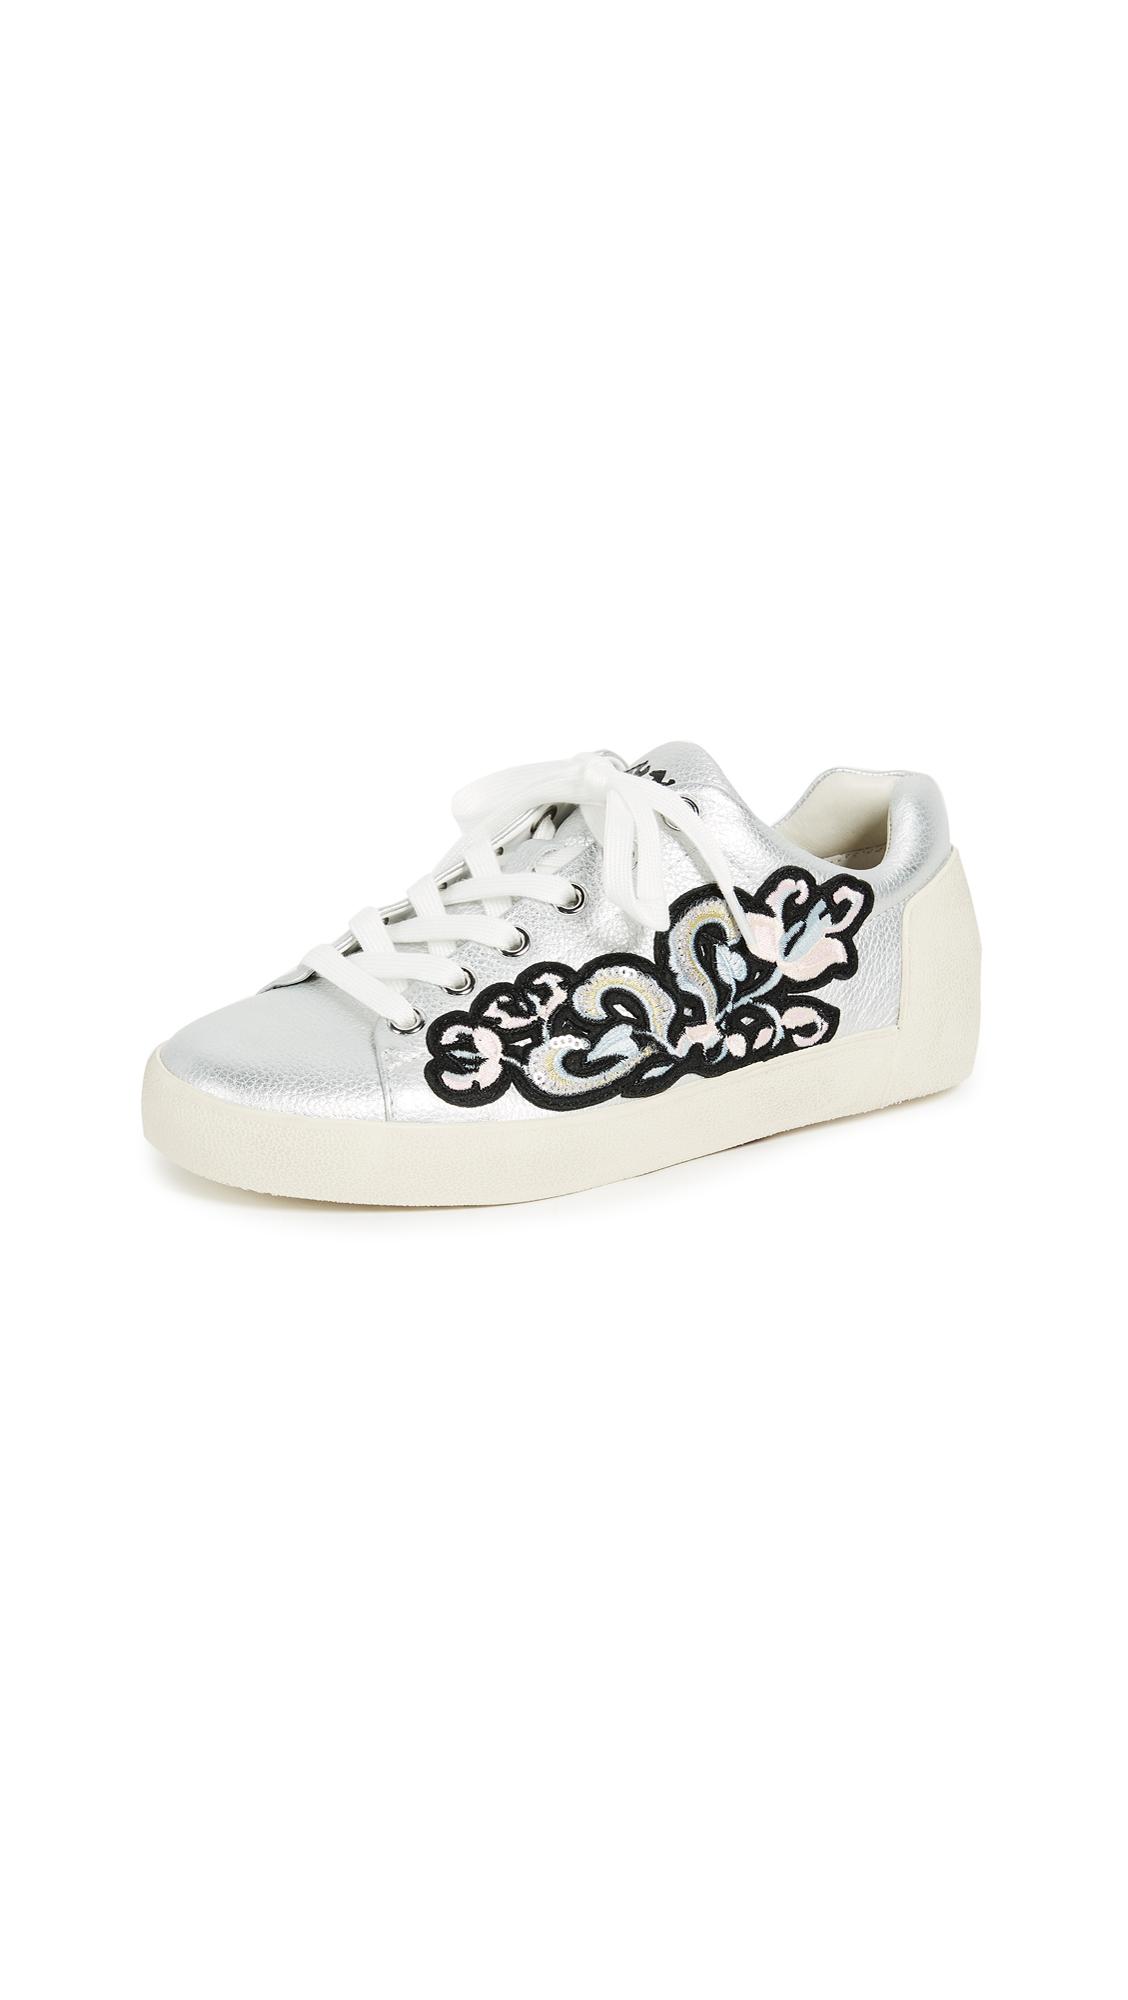 Ash Nak Bis Sneakers - Silver/Black